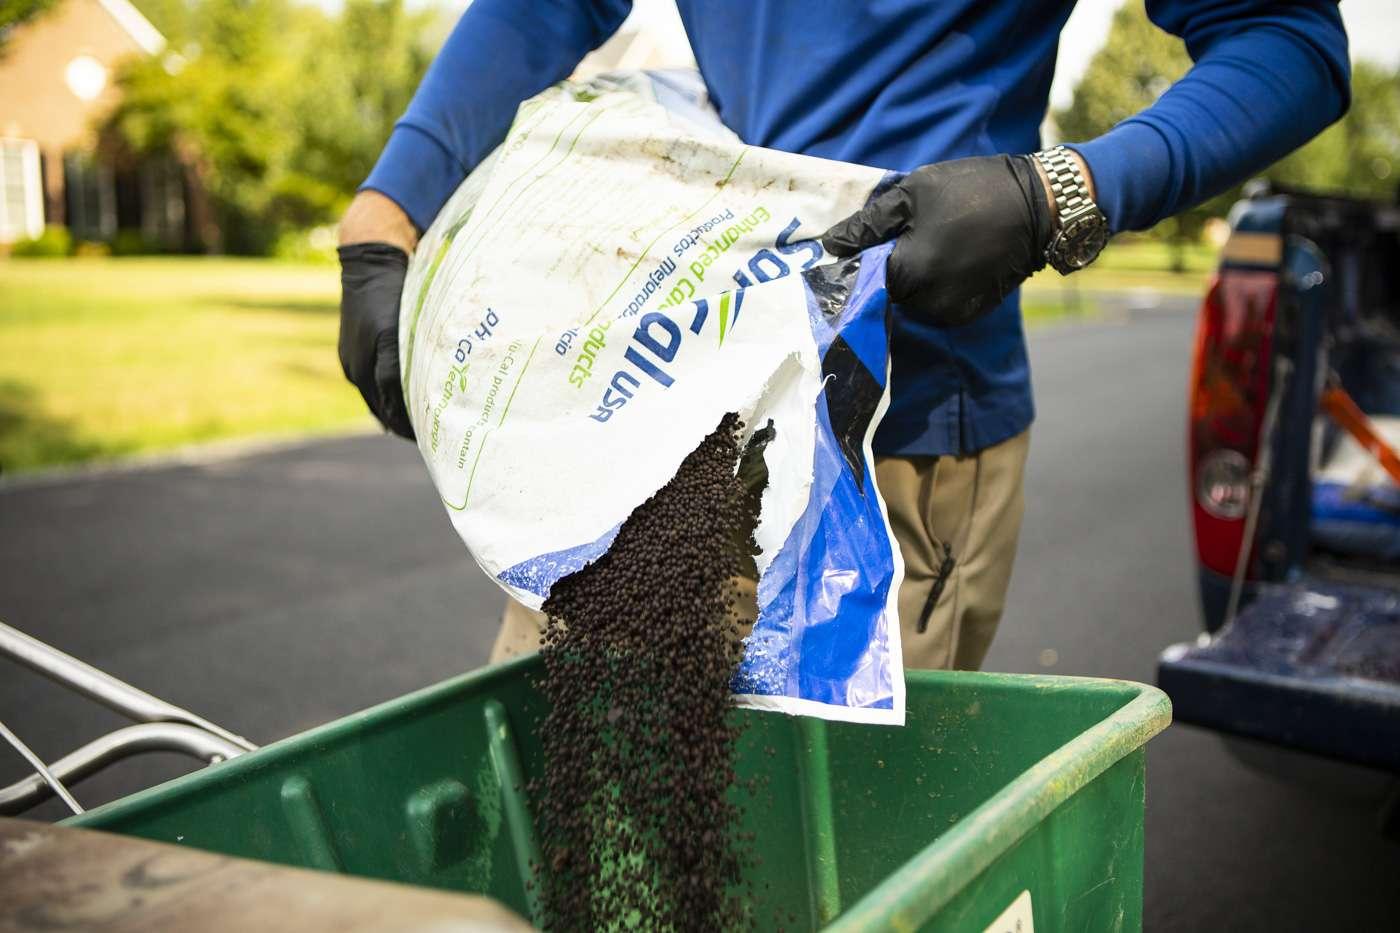 bag of professional lawn fertilizer